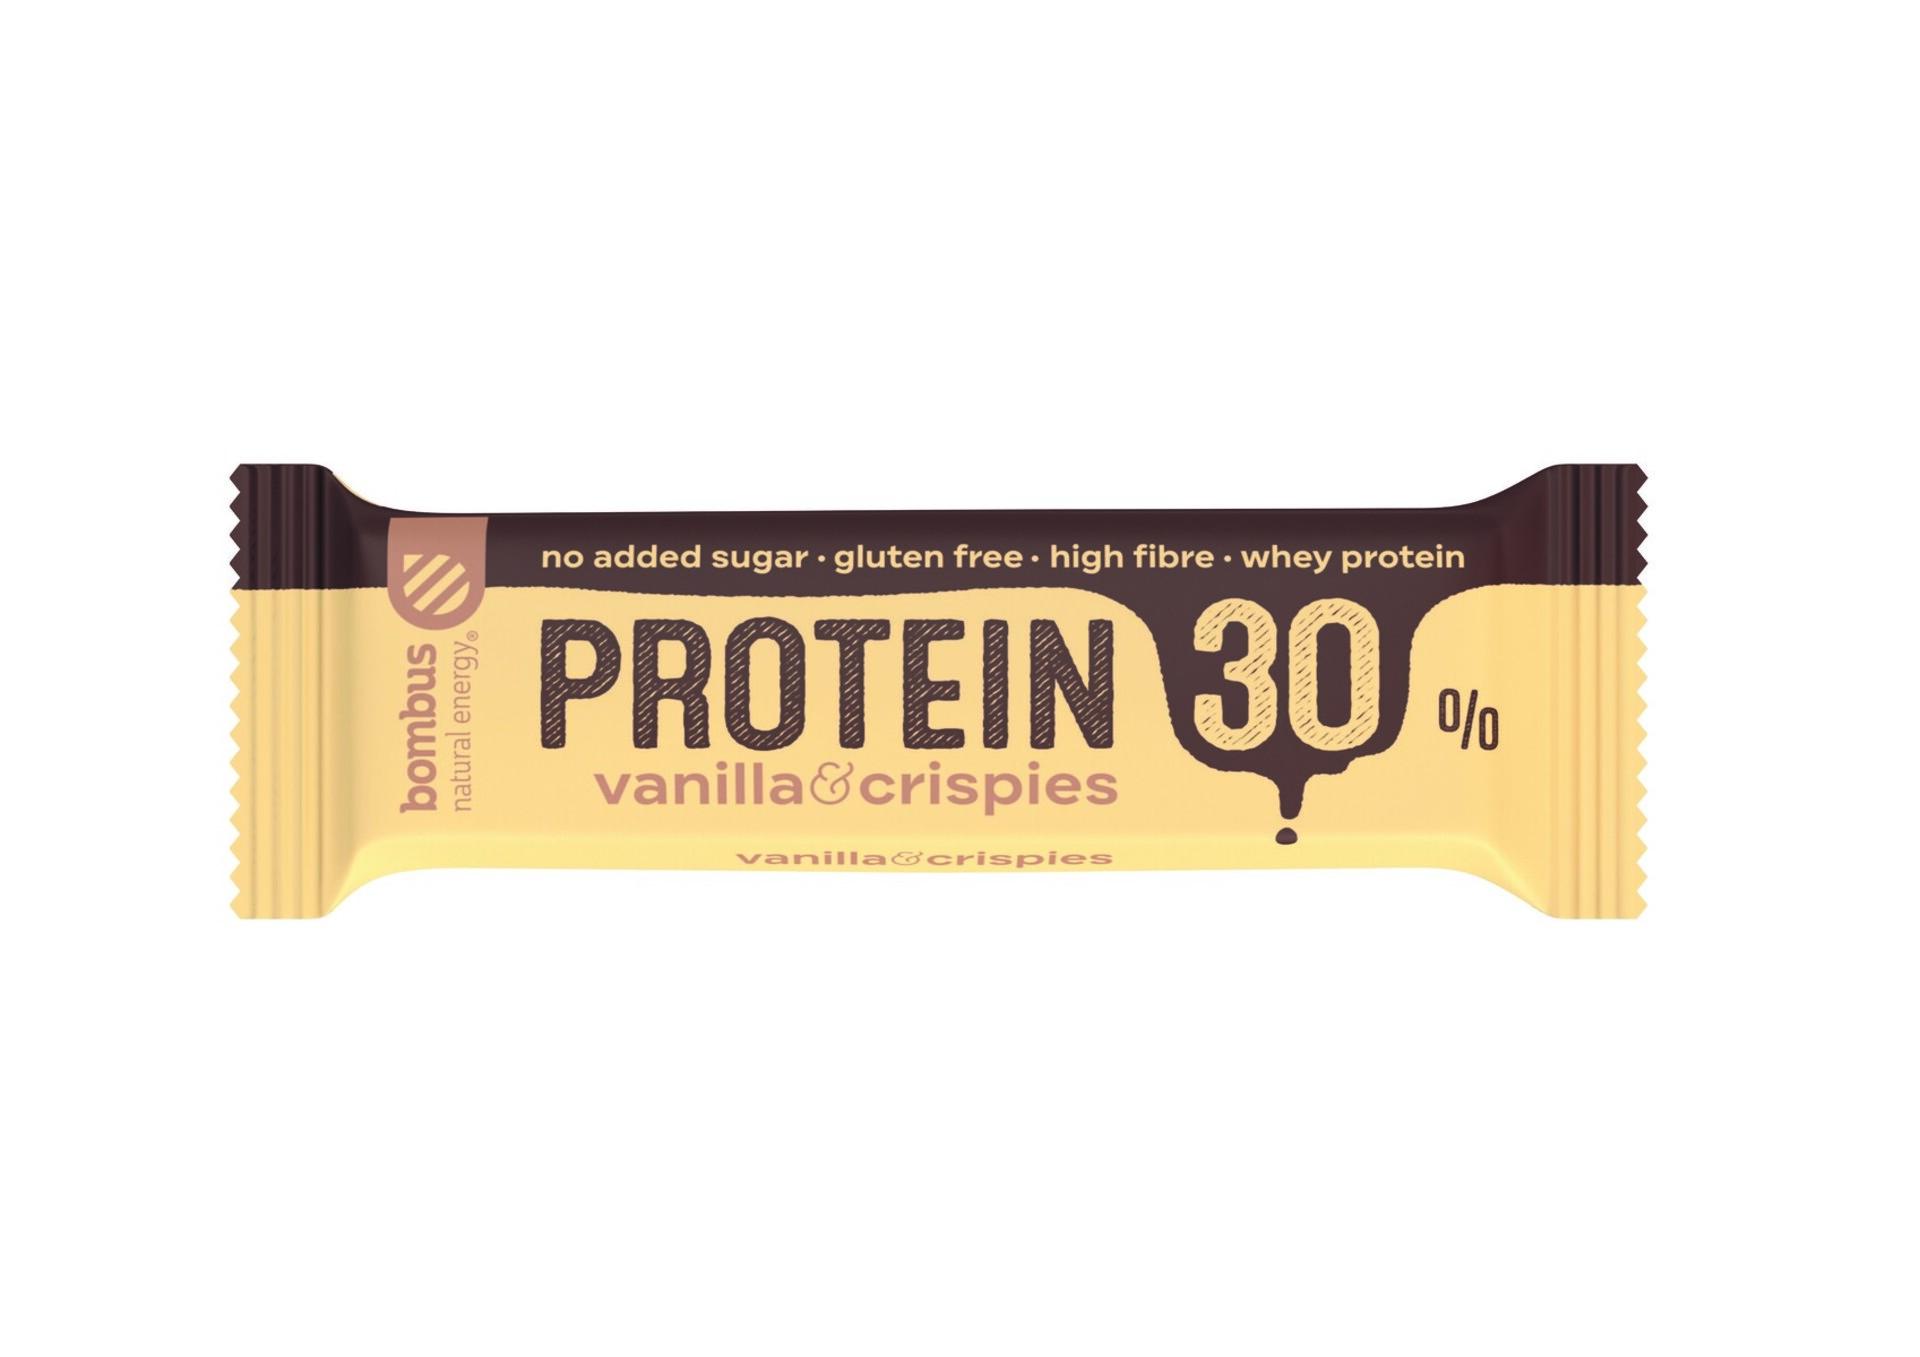 Bombus Proteín 30% Vanilla a crispies 50 g